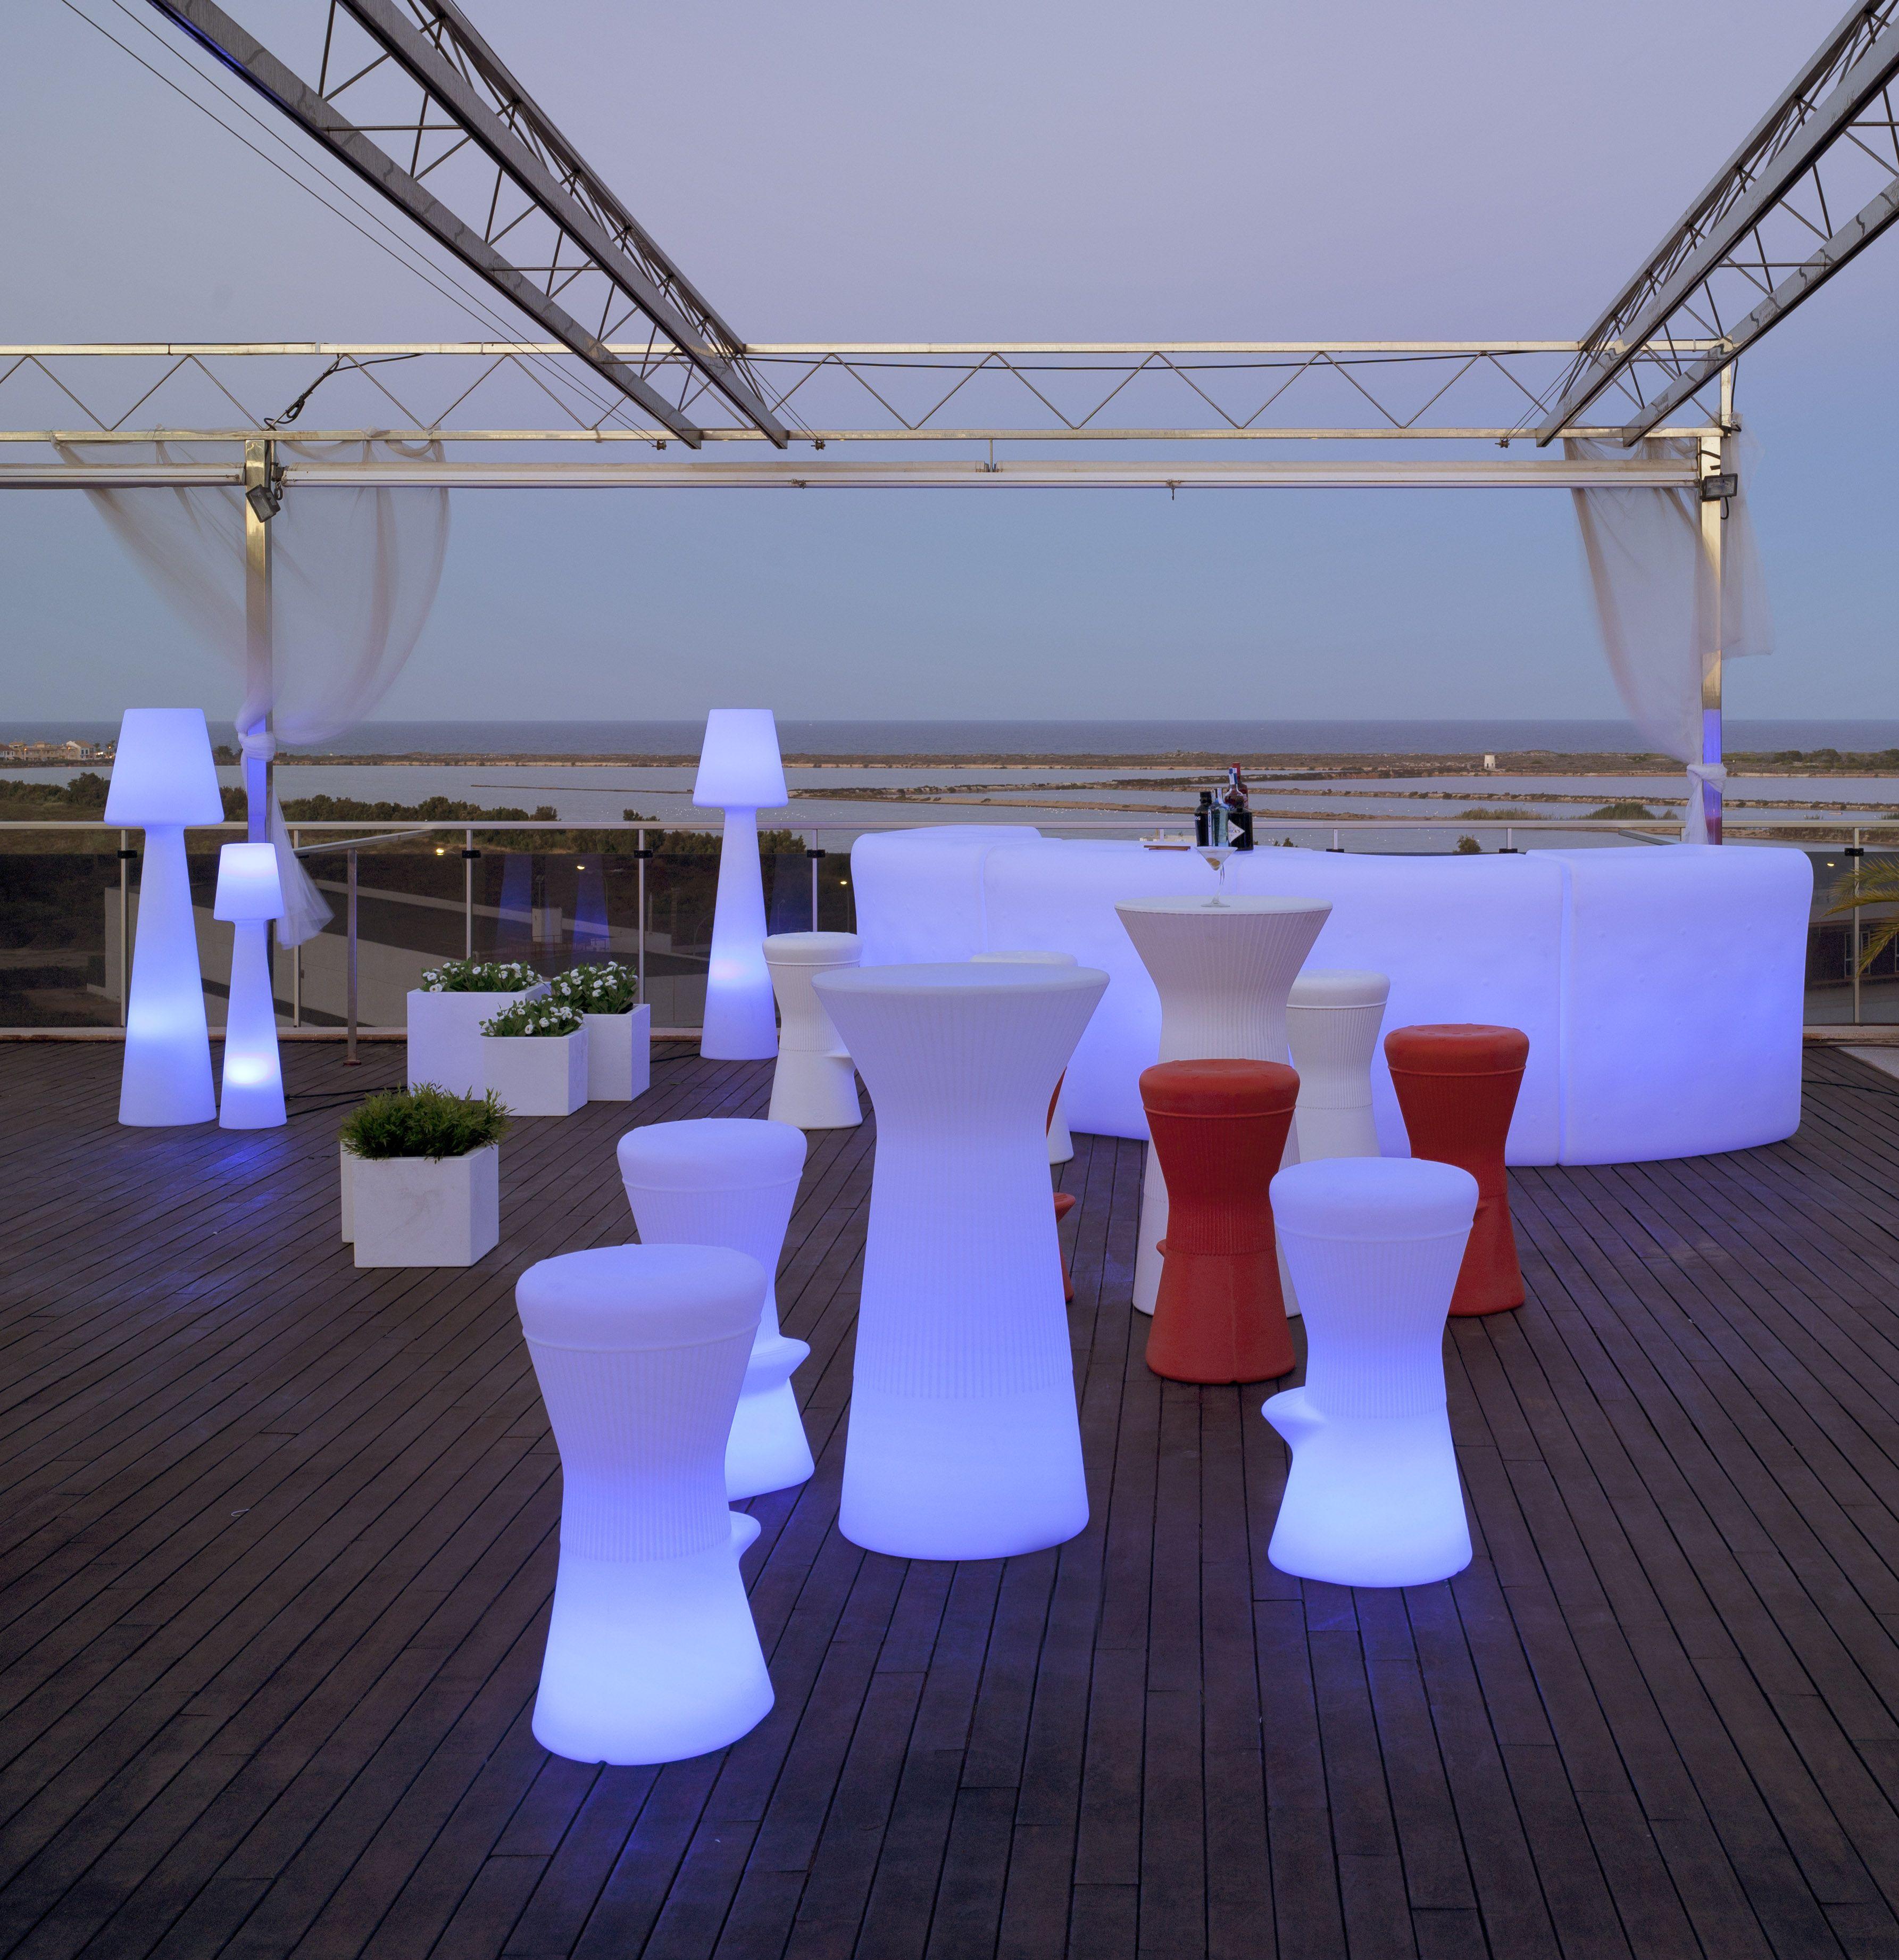 Mobiliario de exterior iluminado sistema inalambrico wireless ...